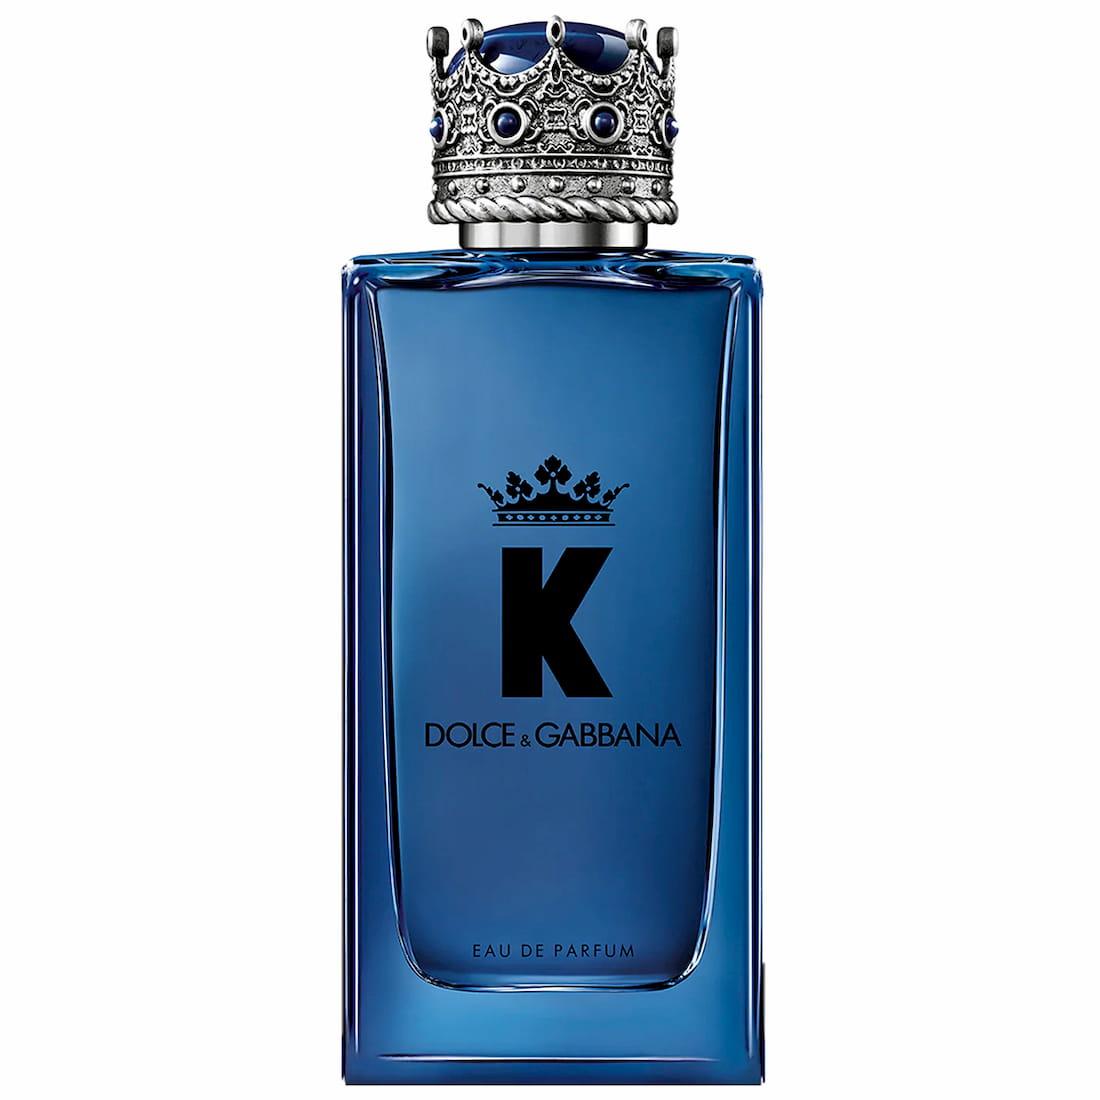 K by Dolce&Gabbana Eau de Parfum - DOLCE & GABBANA